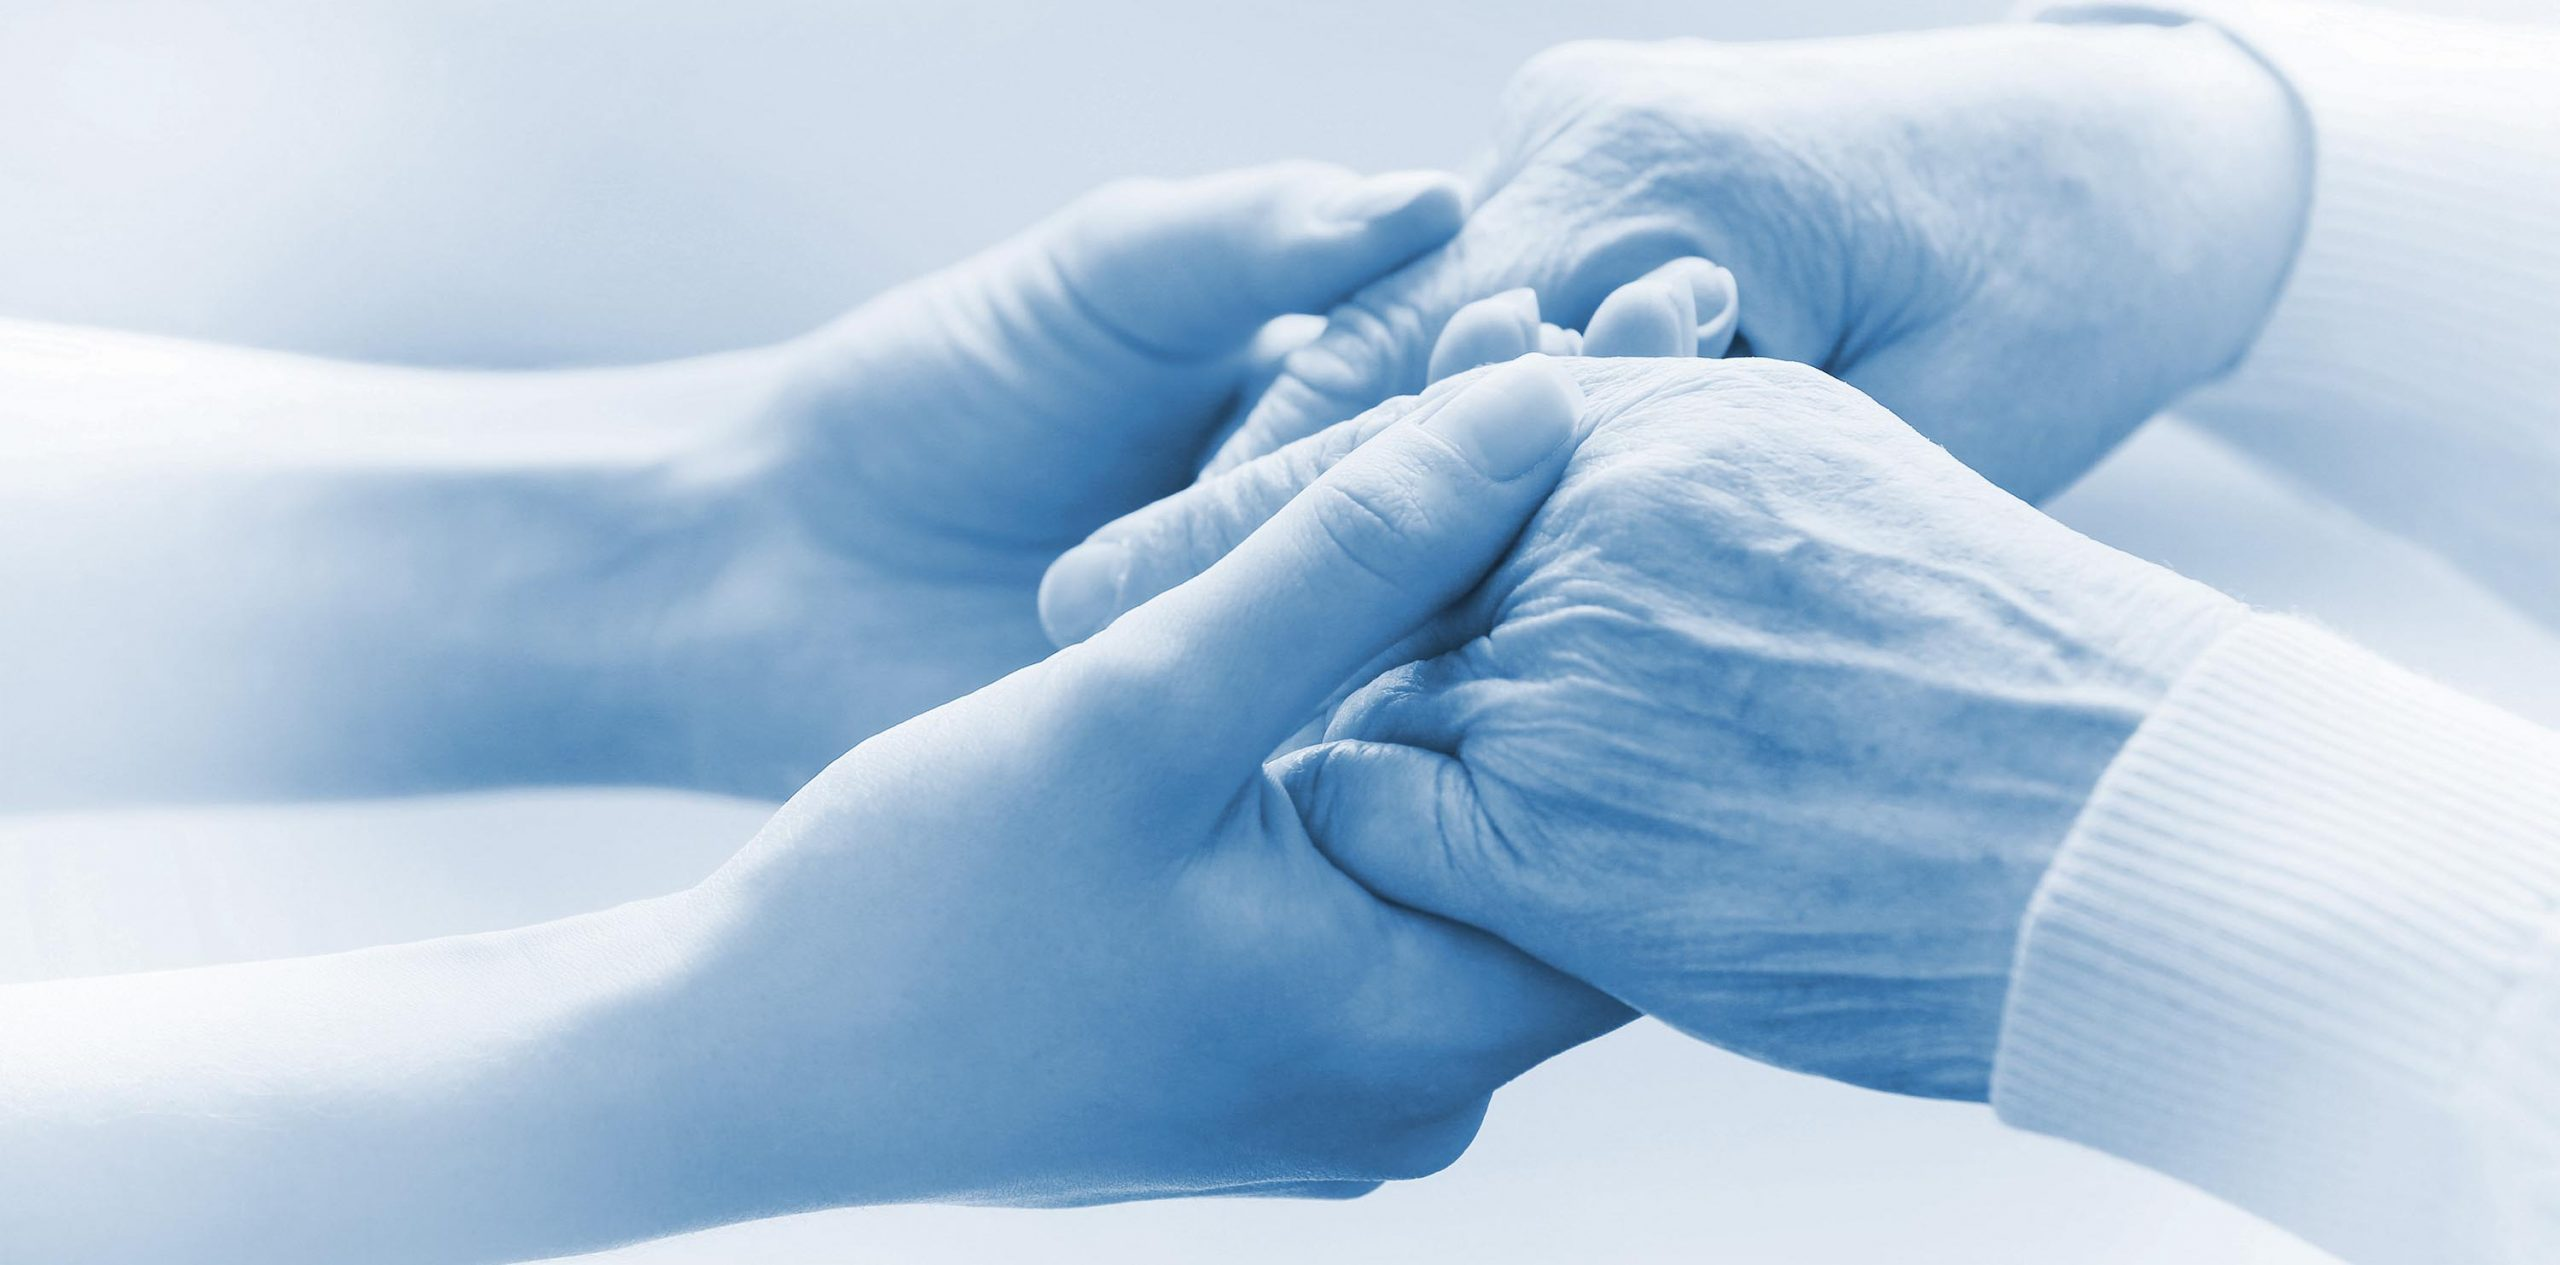 When do seniors need help?, Real McCoy Blog Post